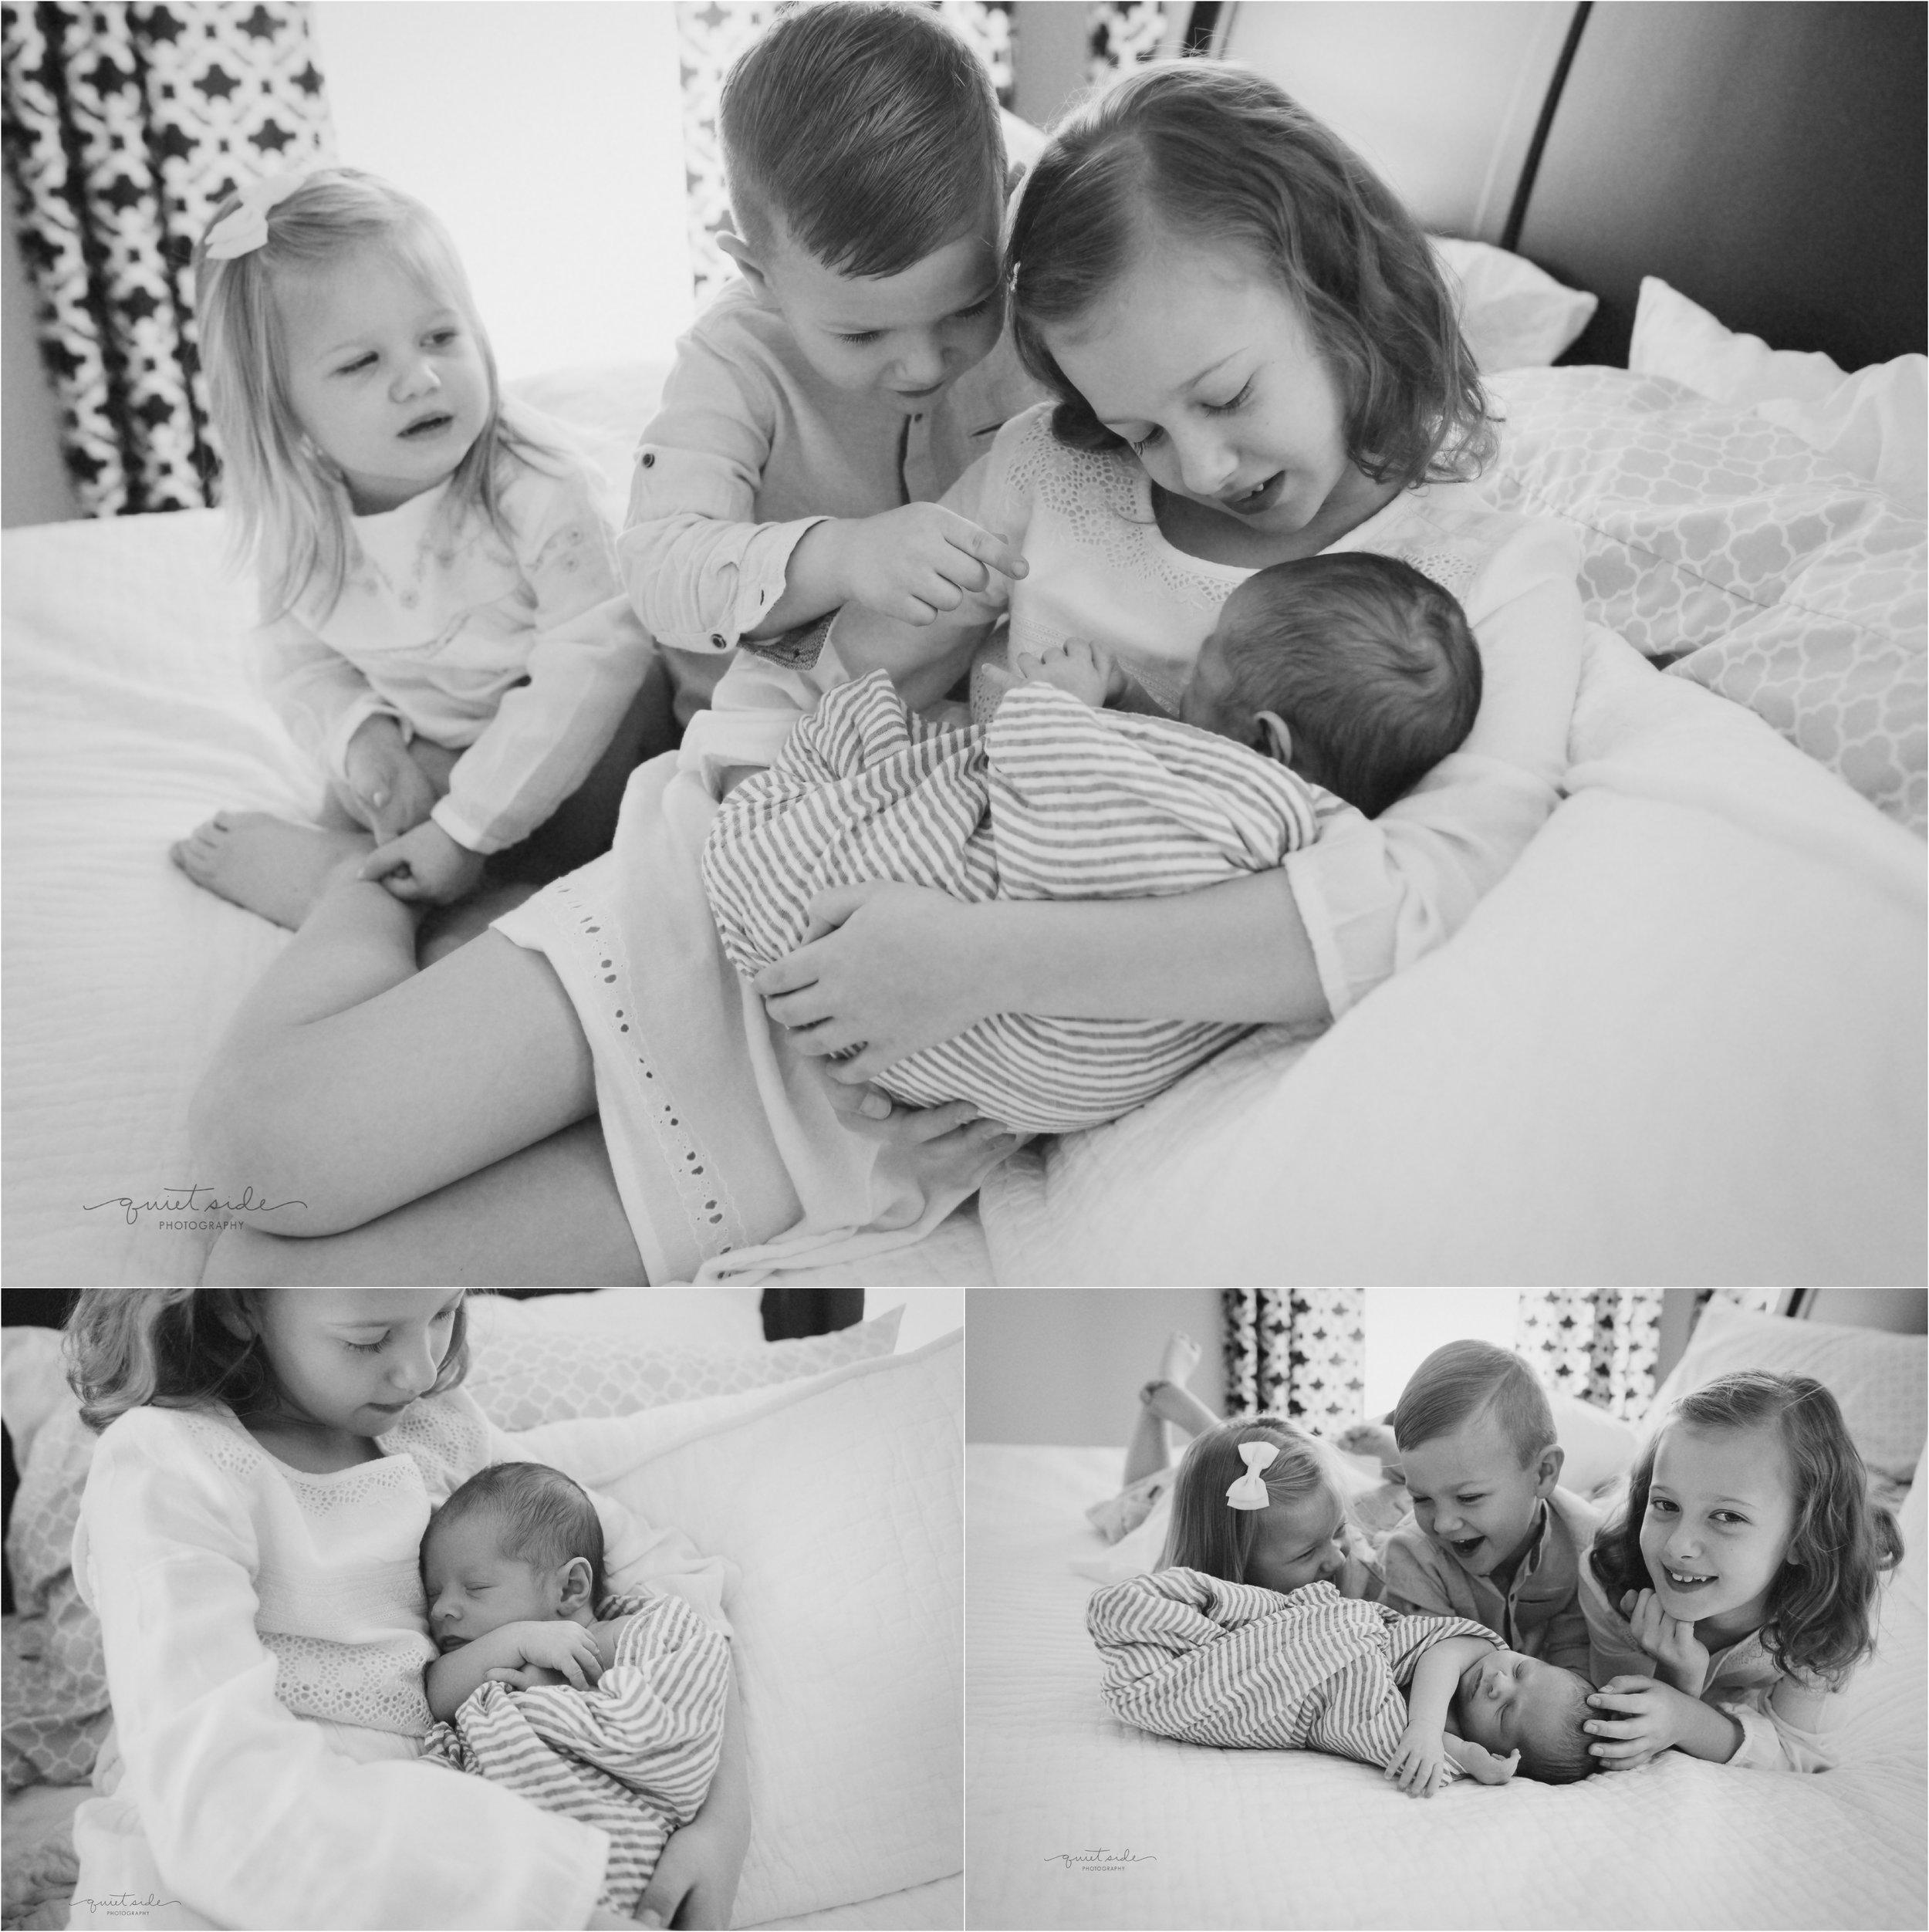 QuietSidePhotography-Purcellville, VA-Newborn-Photographer-Familyof6-siblings.jpg